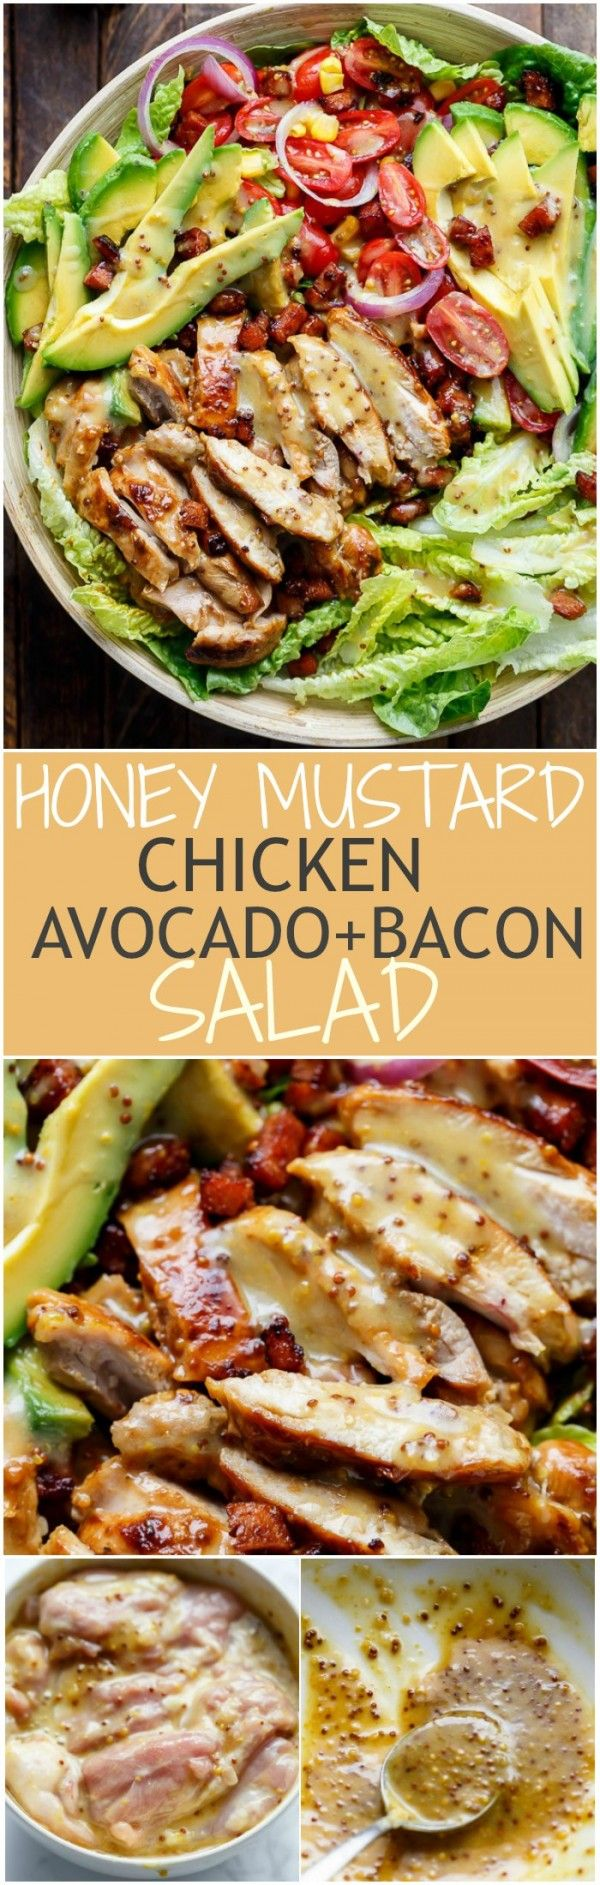 Get the recipe ♥ Honey Mustard Chicken Avocado & Bacon Salad @recipes_to_go #besttoeat